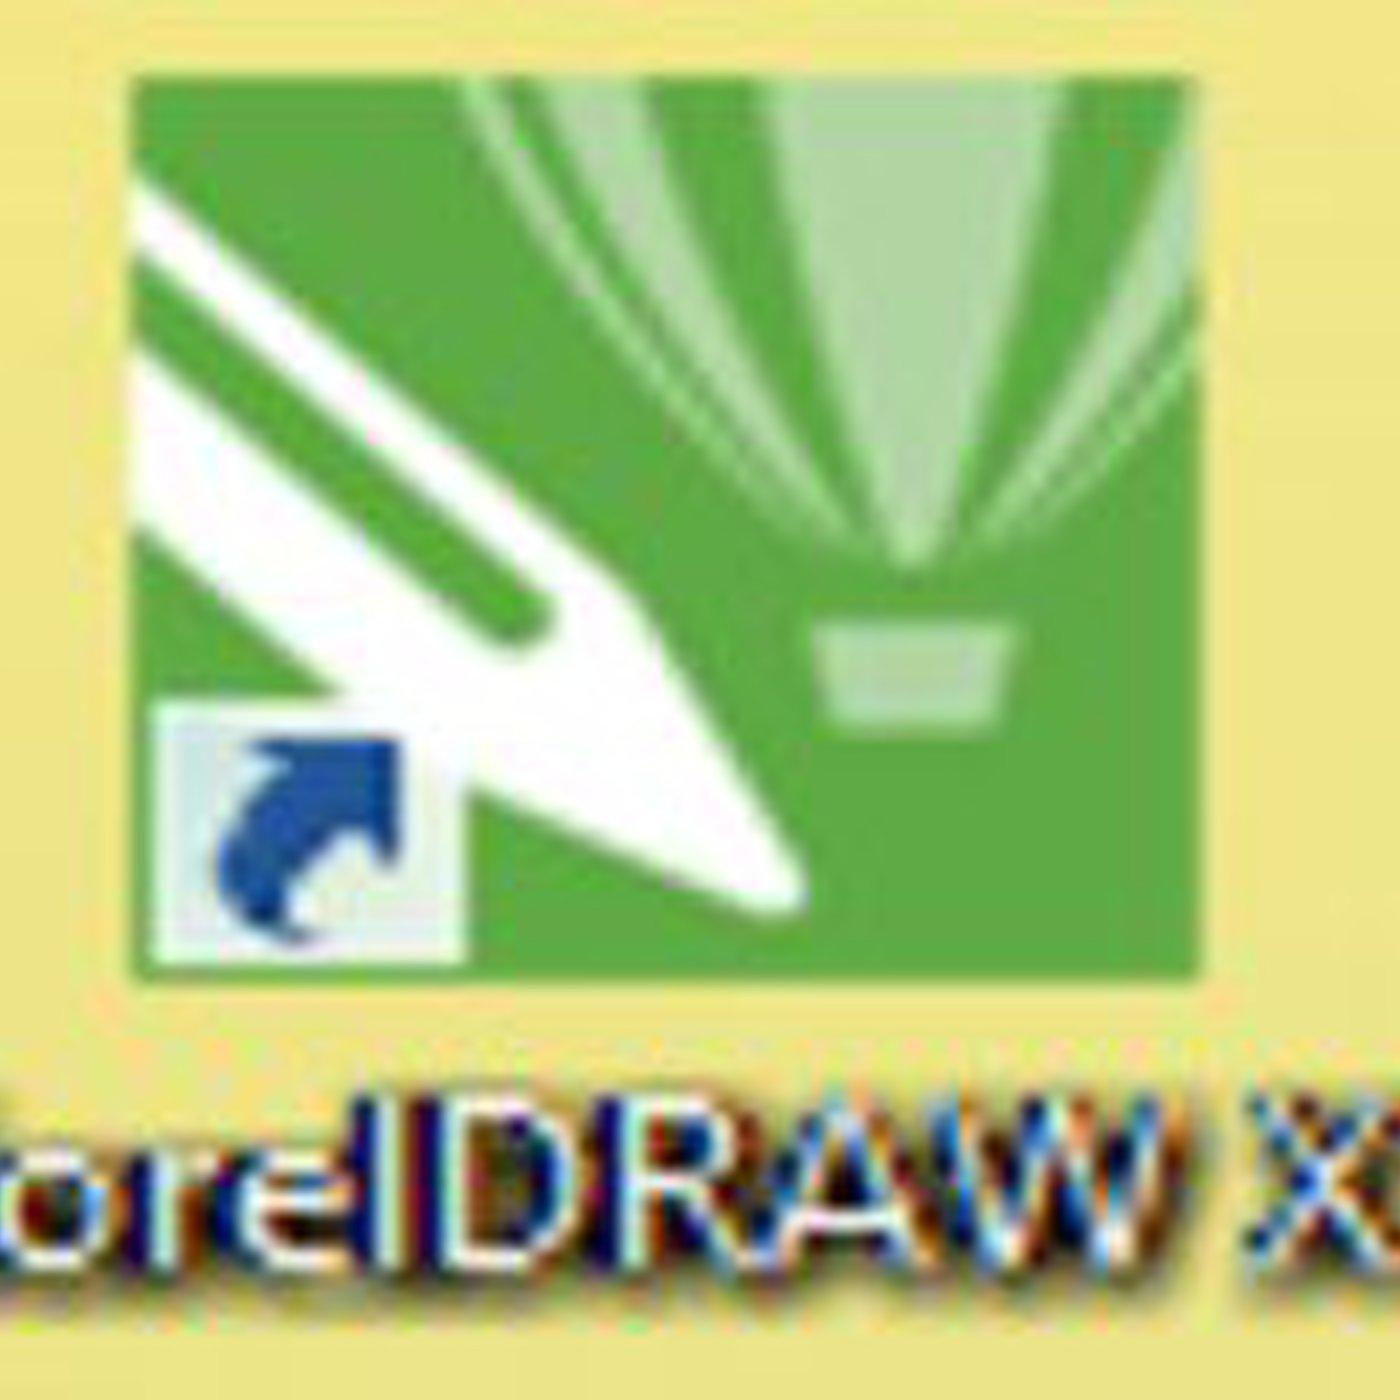 download coreldraw x5 full crack bagas31